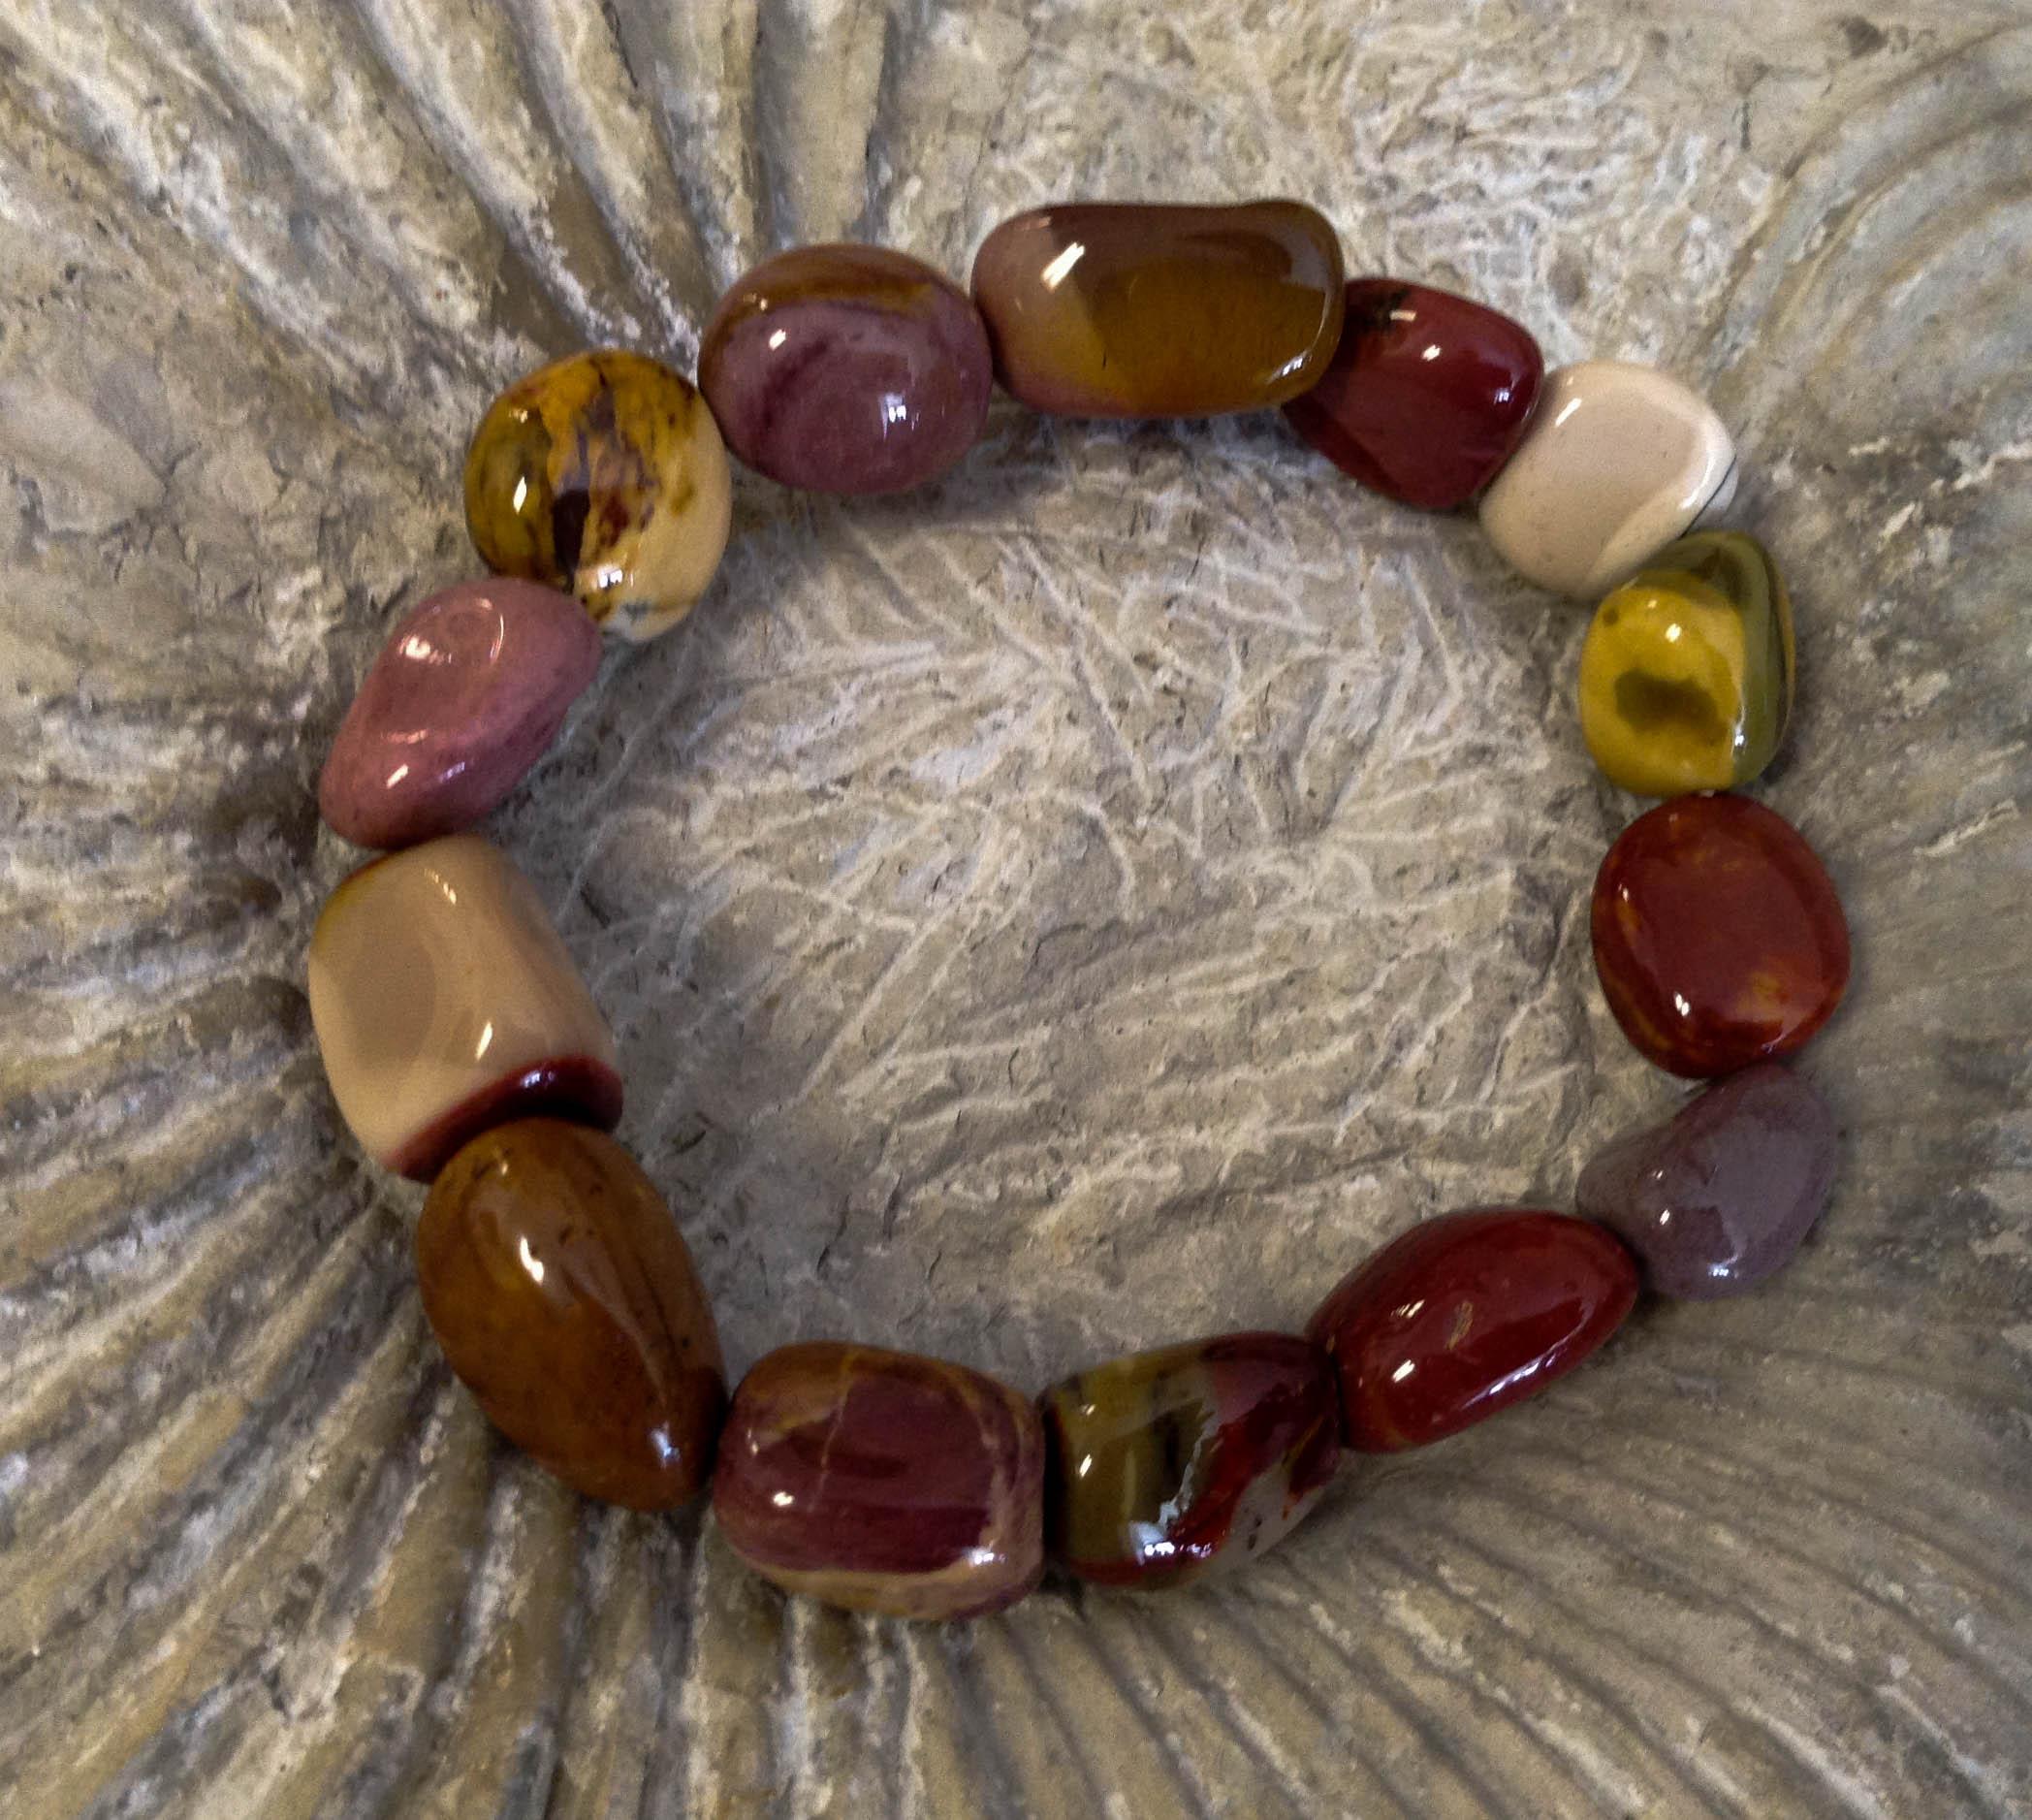 Cleansing Meditation Healing Mookaite Jasper Slabs Therapy Group #2 Massage Reiki Mookaite Crystal Gemstone